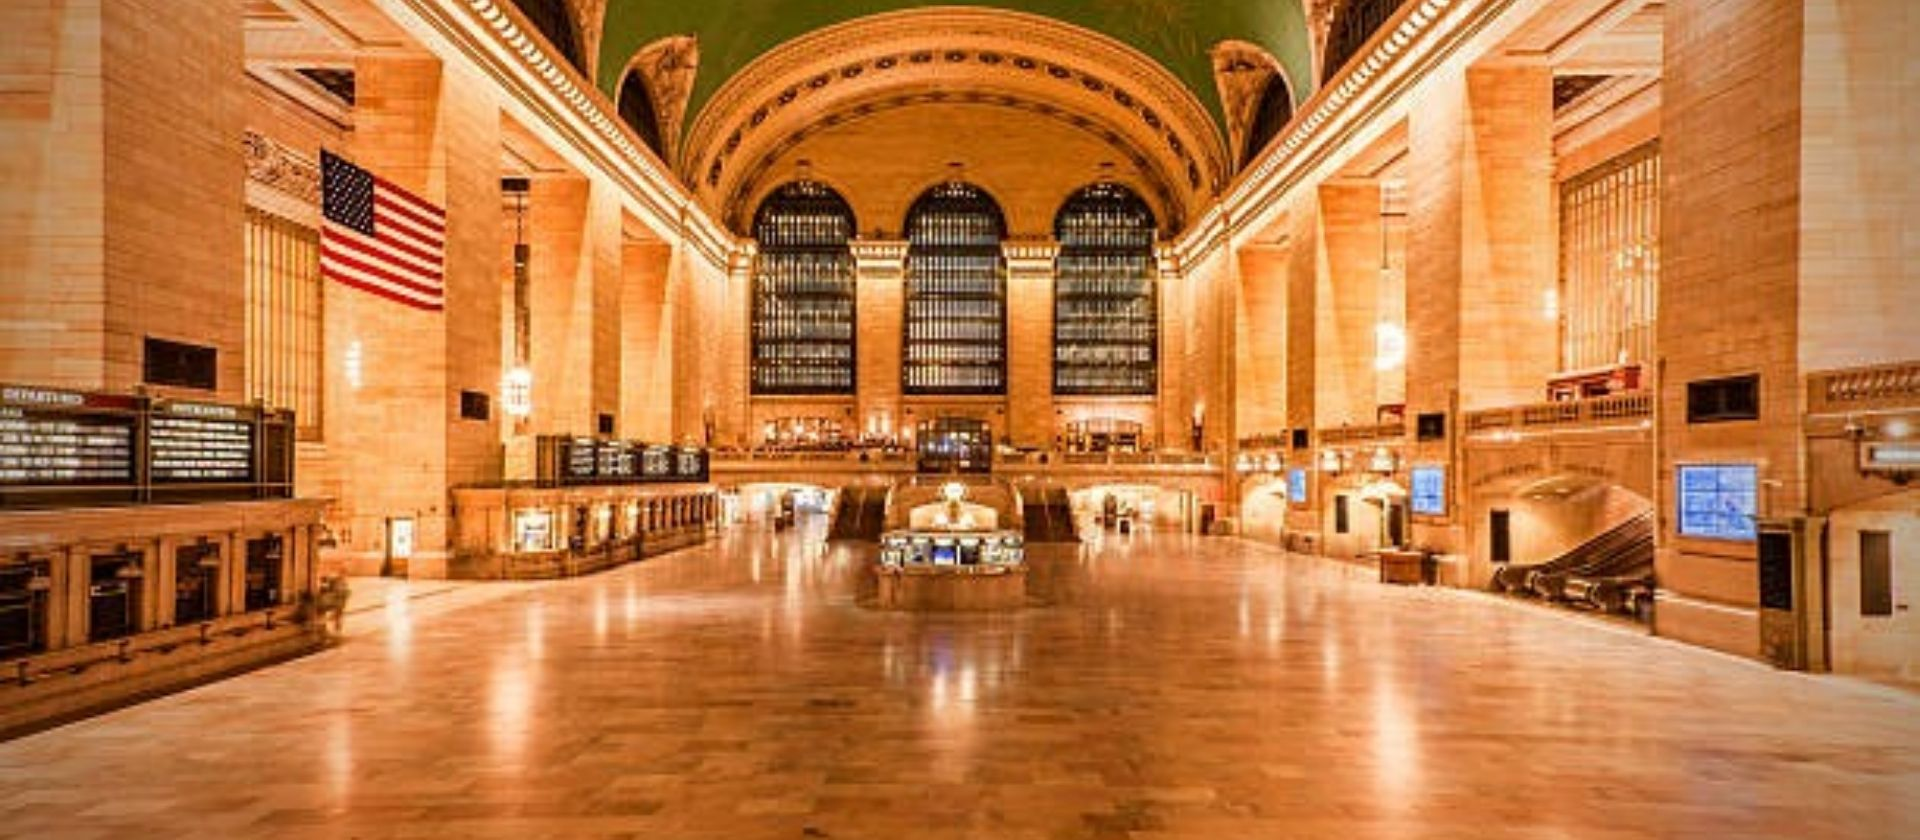 grand central terminal empty coronavirus new york